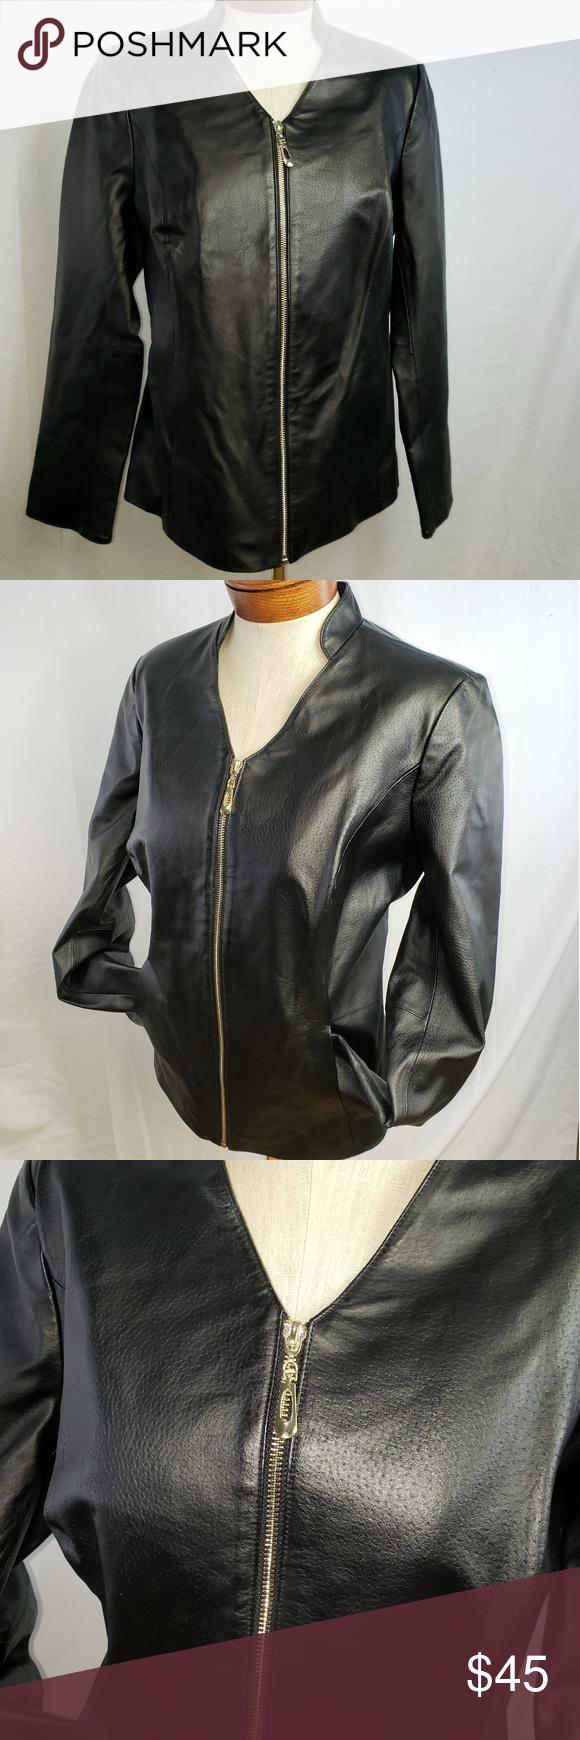 IMAN Genuine Black Leather Jacket Near Prestine Black